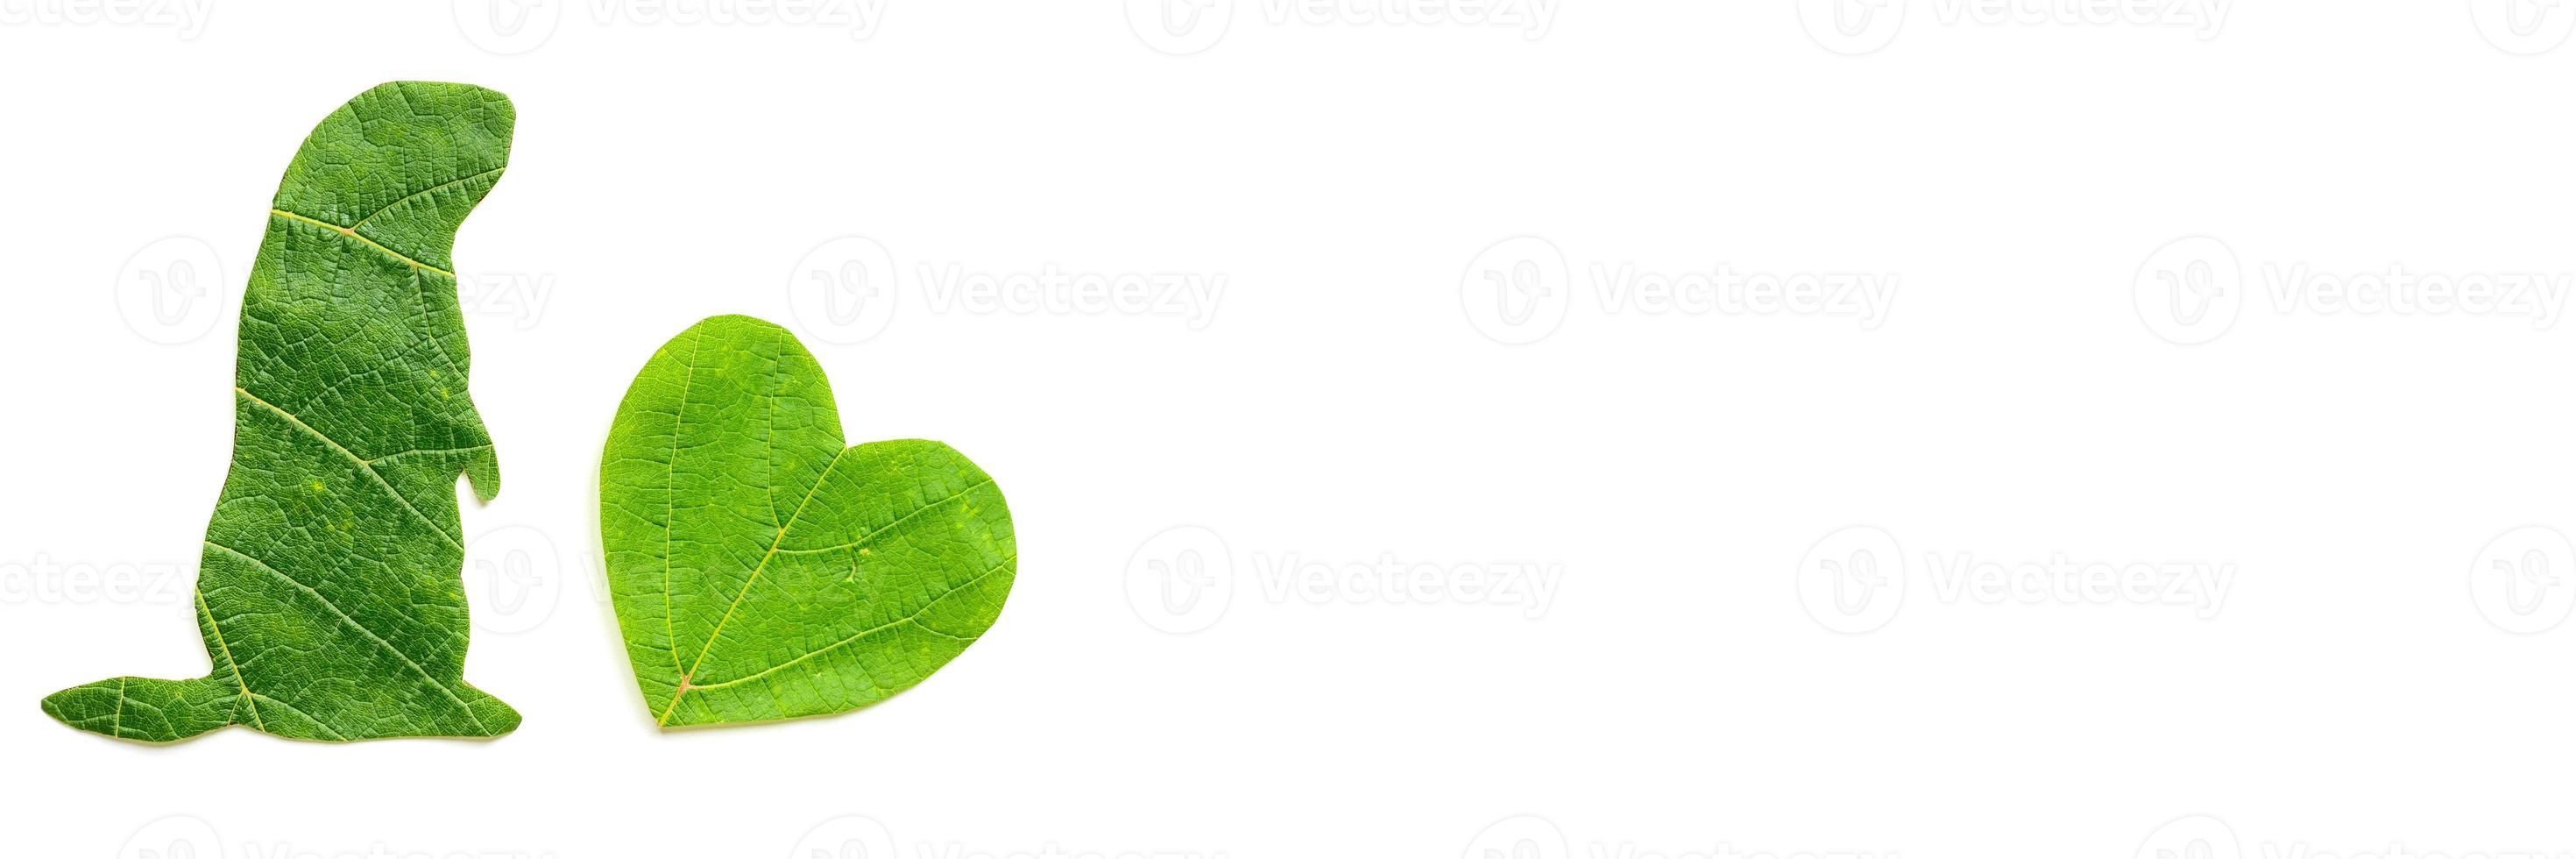 la silueta del animal se corta de follaje verde sobre un fondo blanco foto